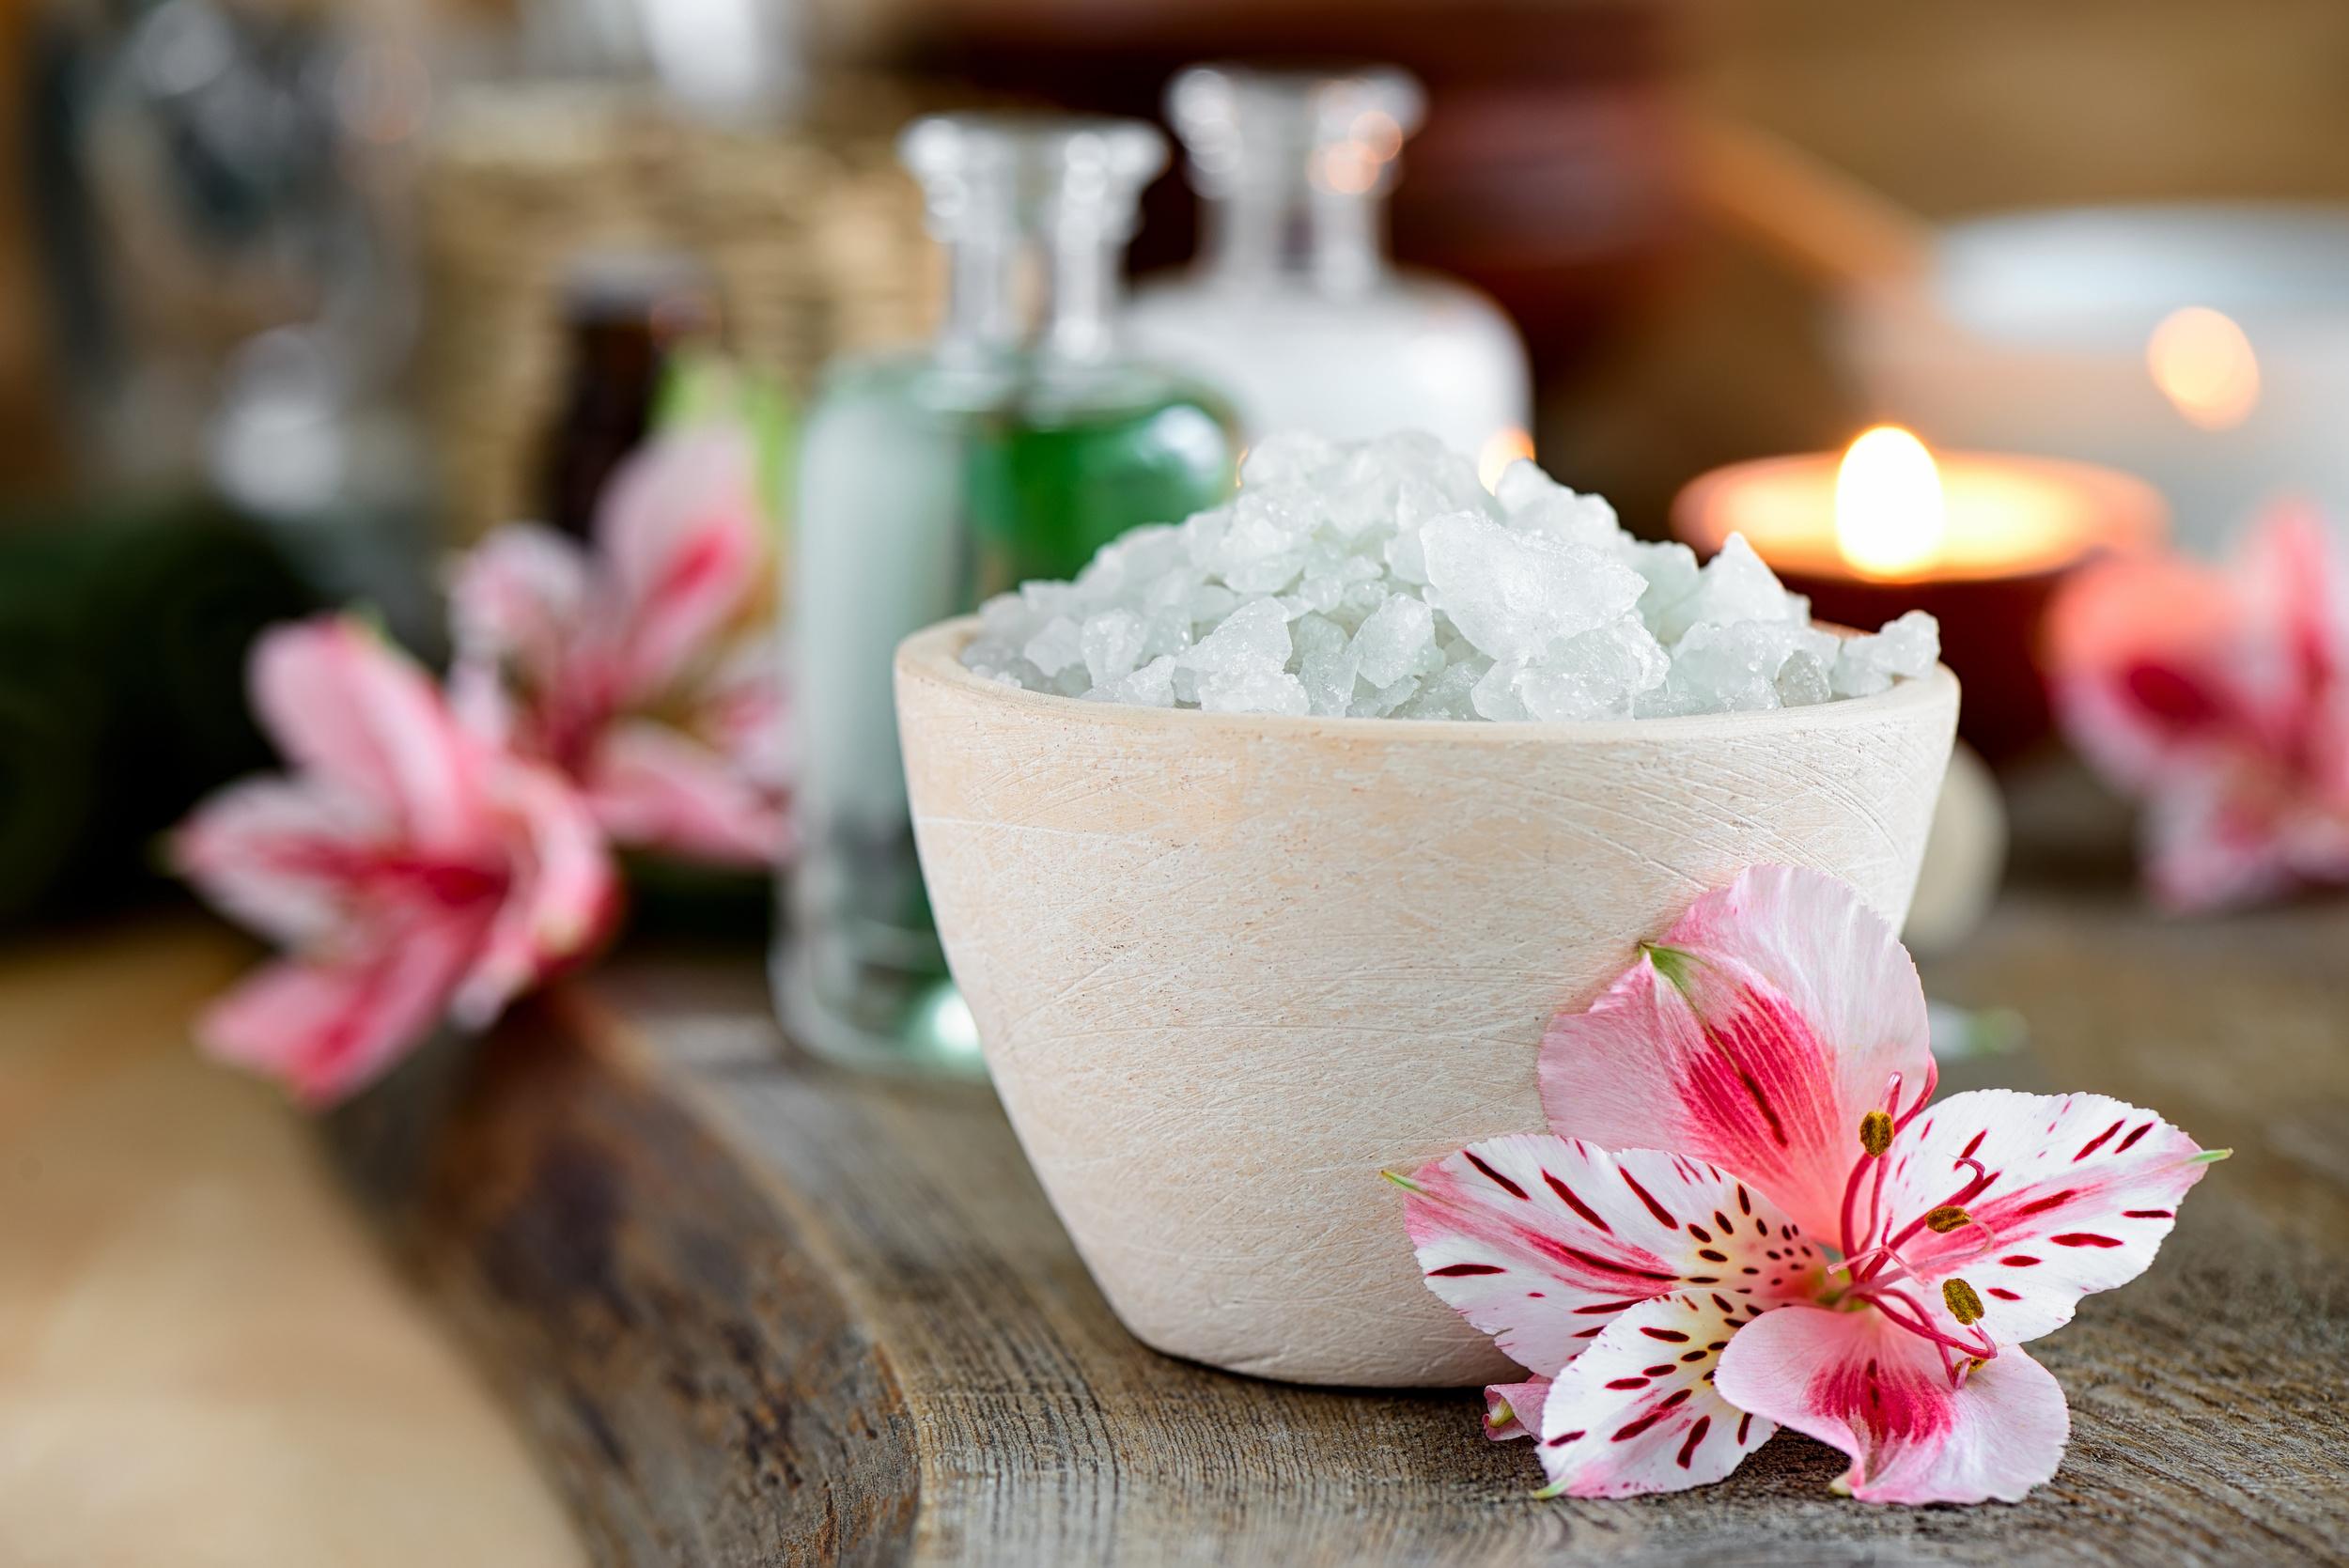 Sensom Health and Wellbeing massage reflexology